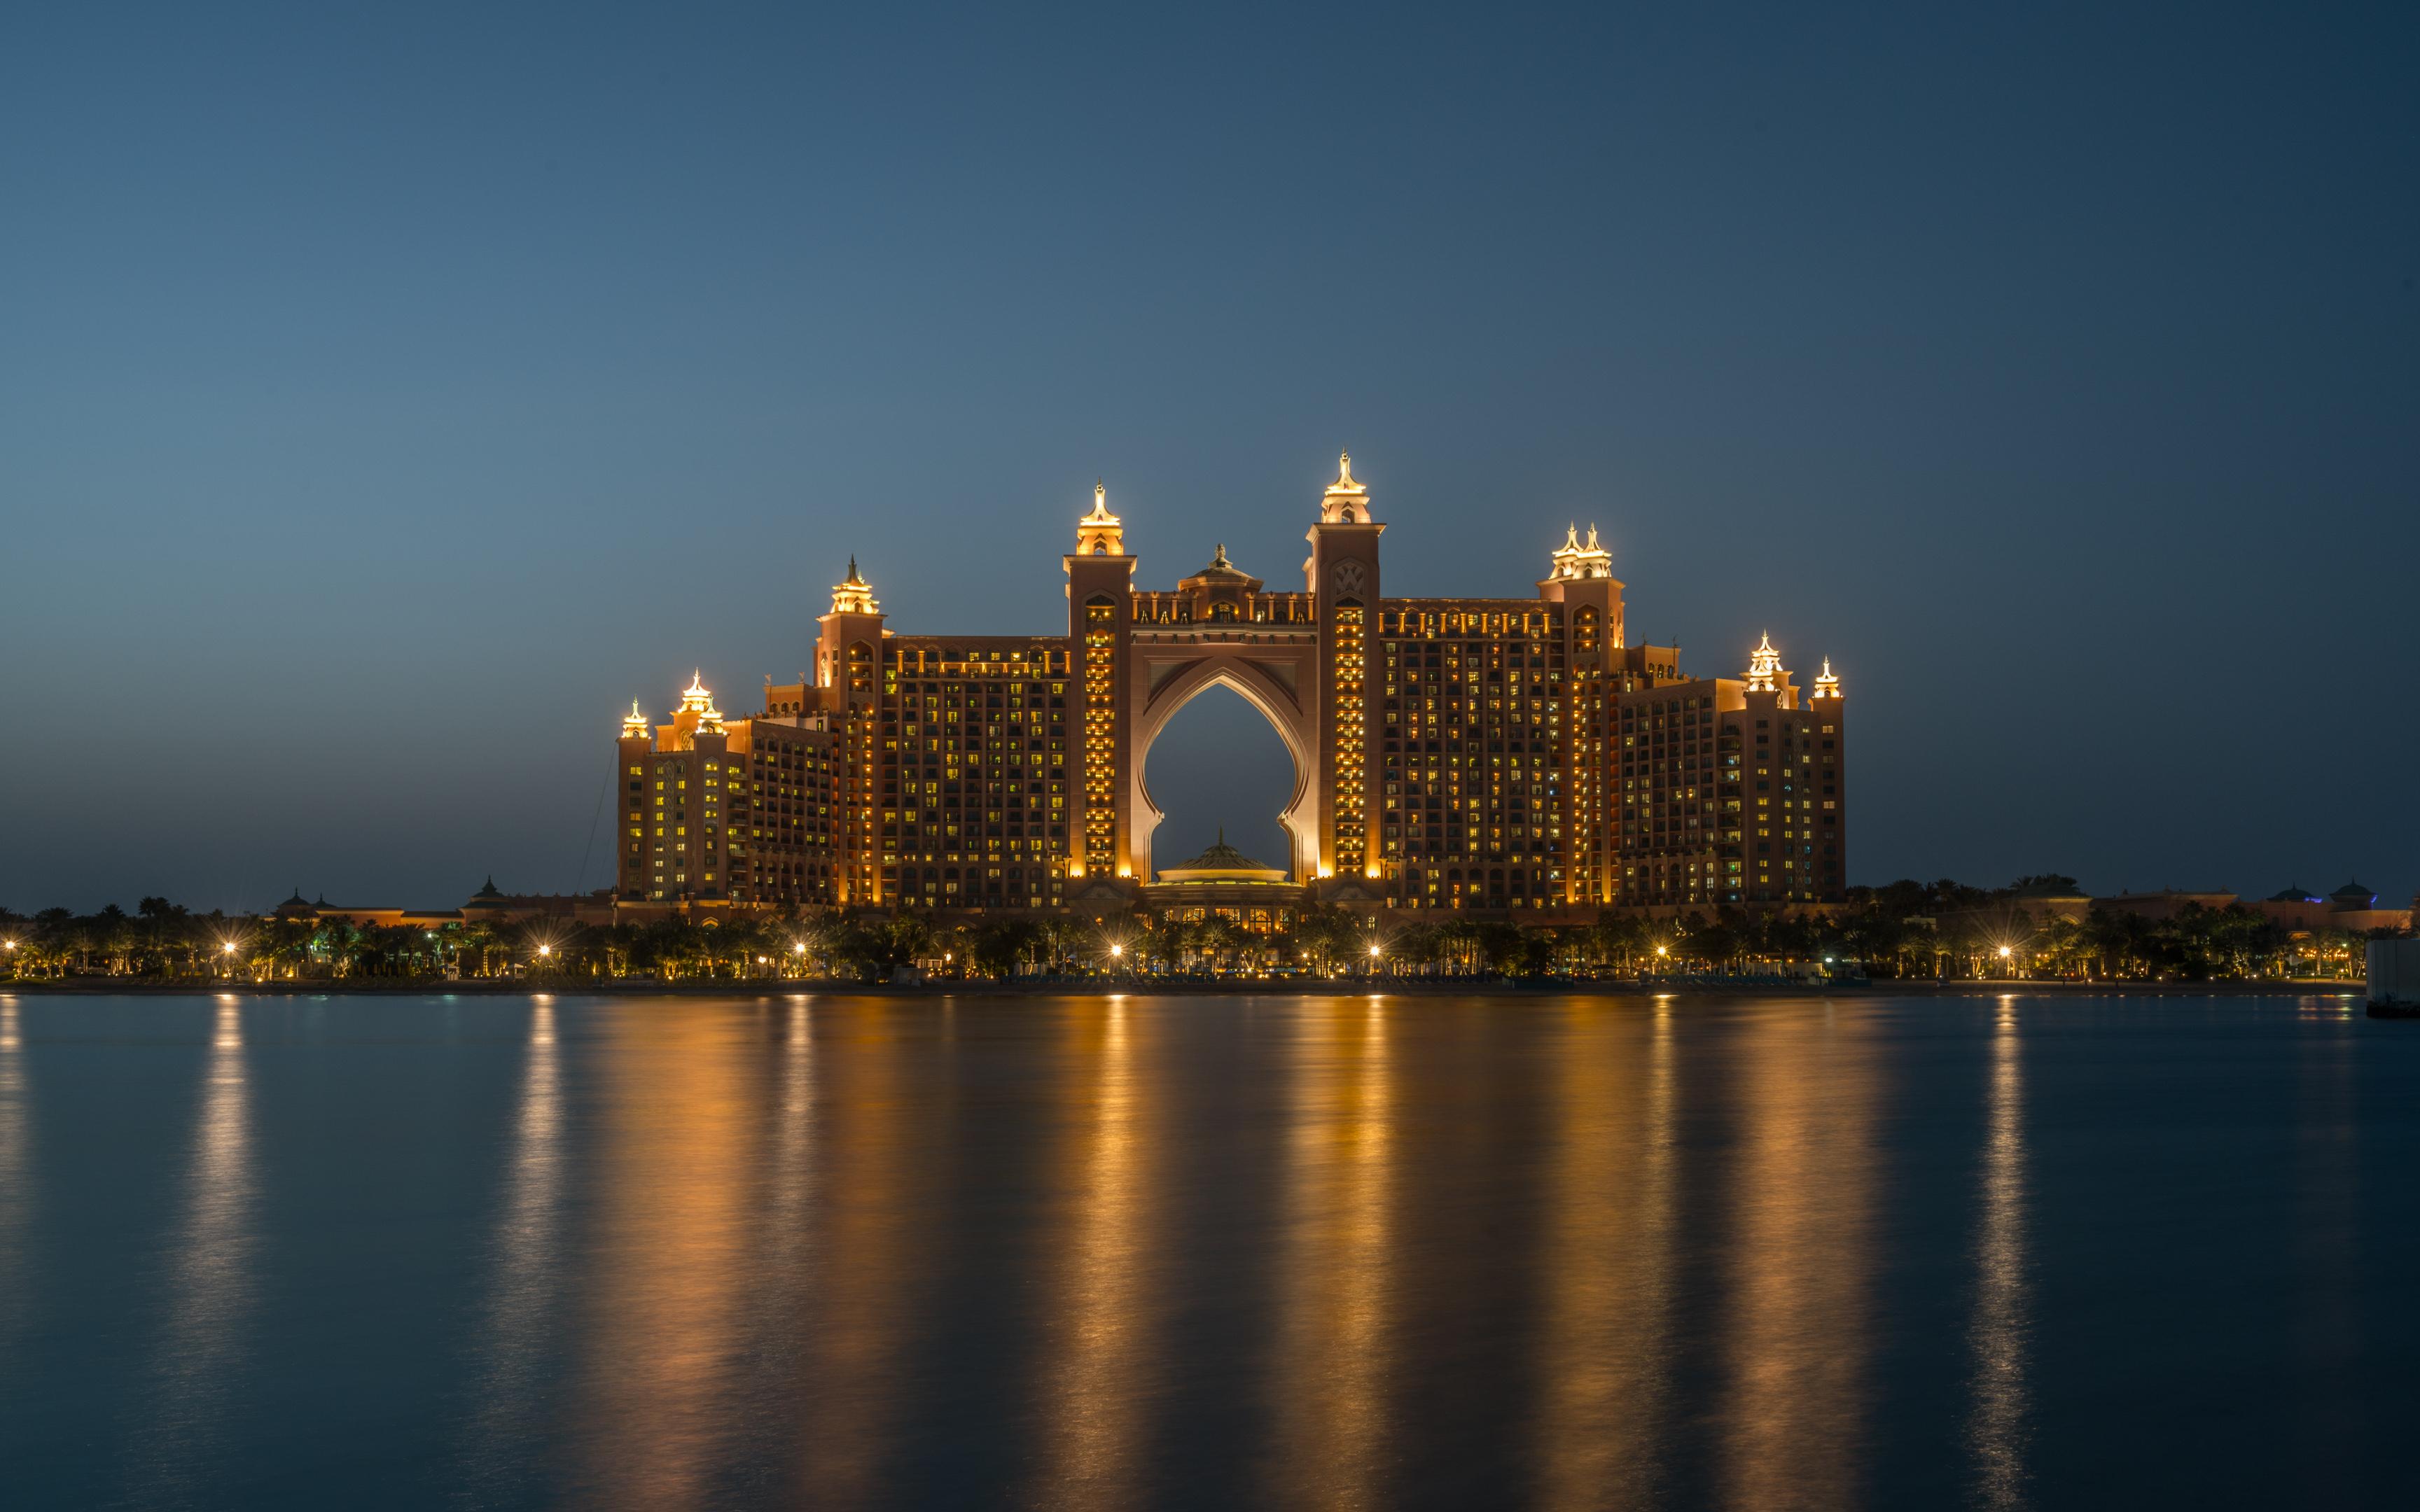 Dubai Atlantis and Jumeirah from The Palm